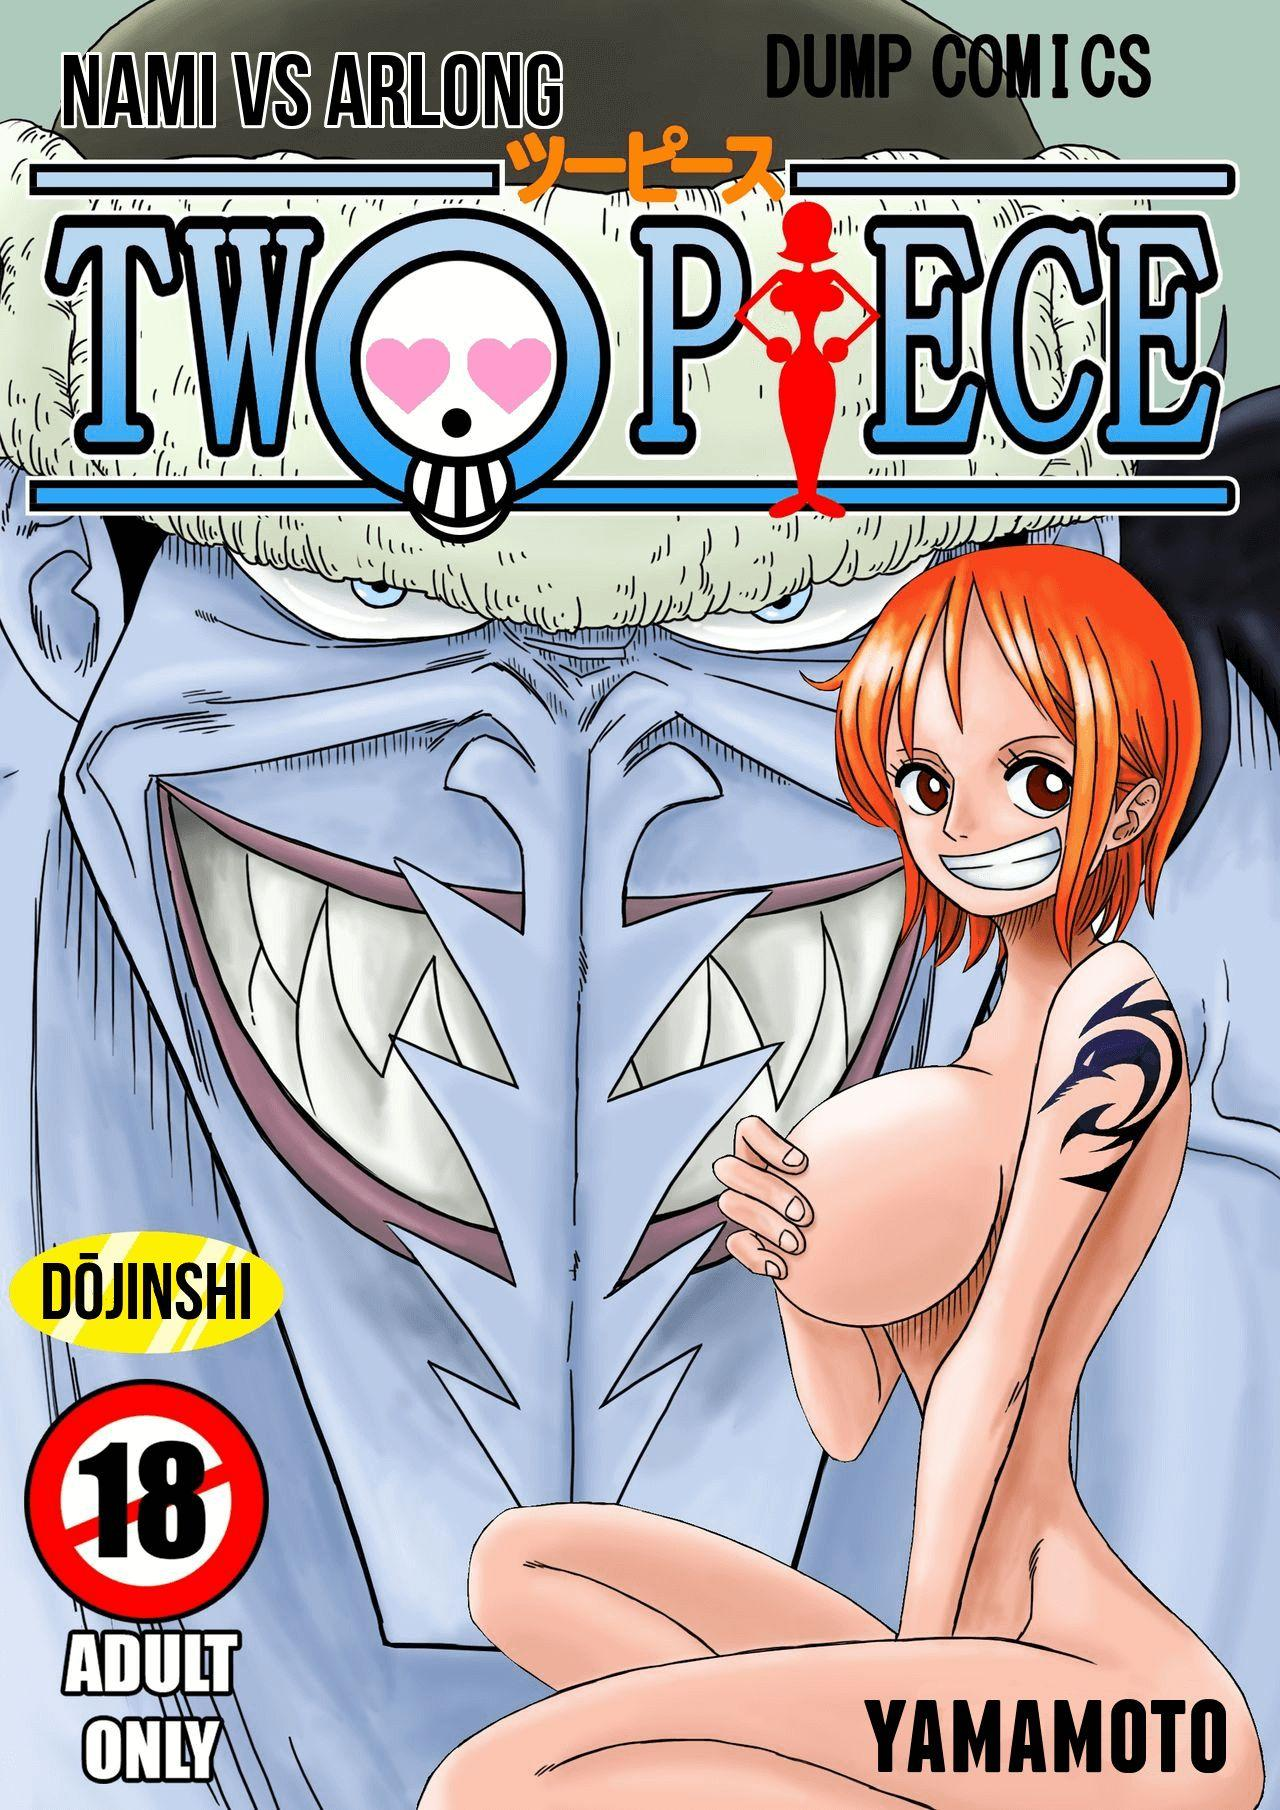 Two Piece - Nami vs Arlong 0